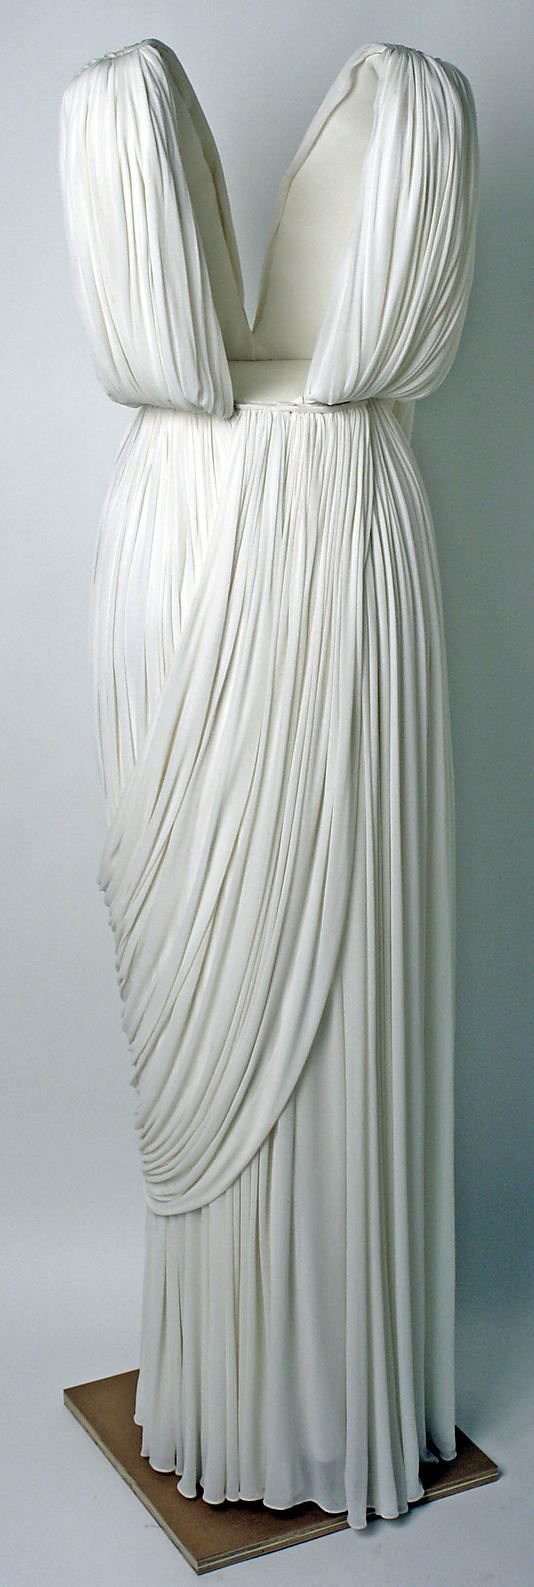 Evening dress Madame Grès (Alix Barton)  (French, Paris 1903–1993 Var region)   Date: ca. 1965 Culture: French Medium: silk. Back